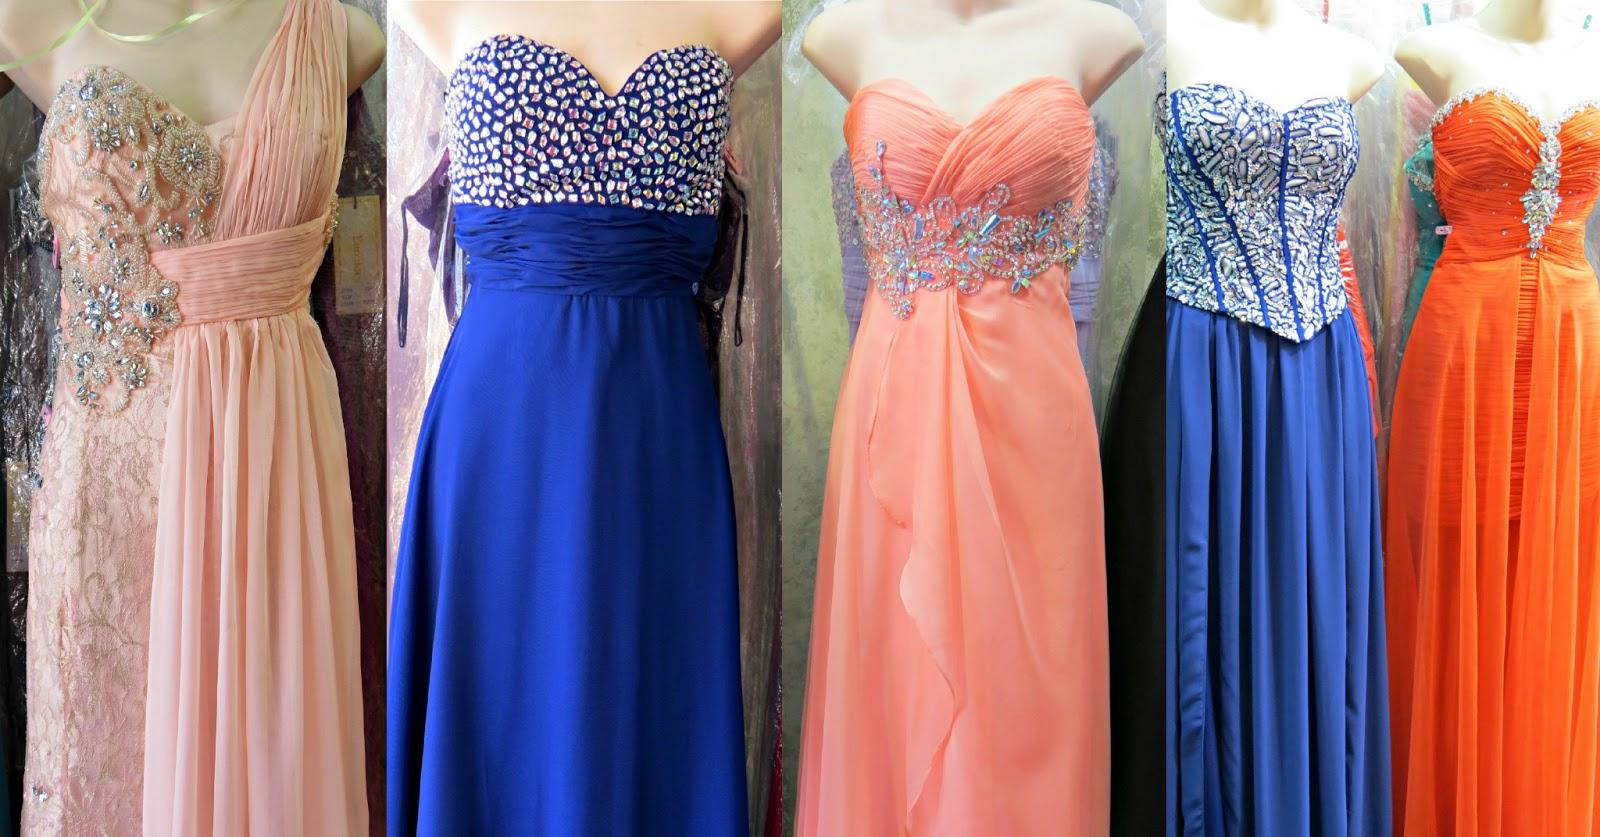 Prom dresses prom dresses garment district los angeles for Wedding dresses los angeles fashion district